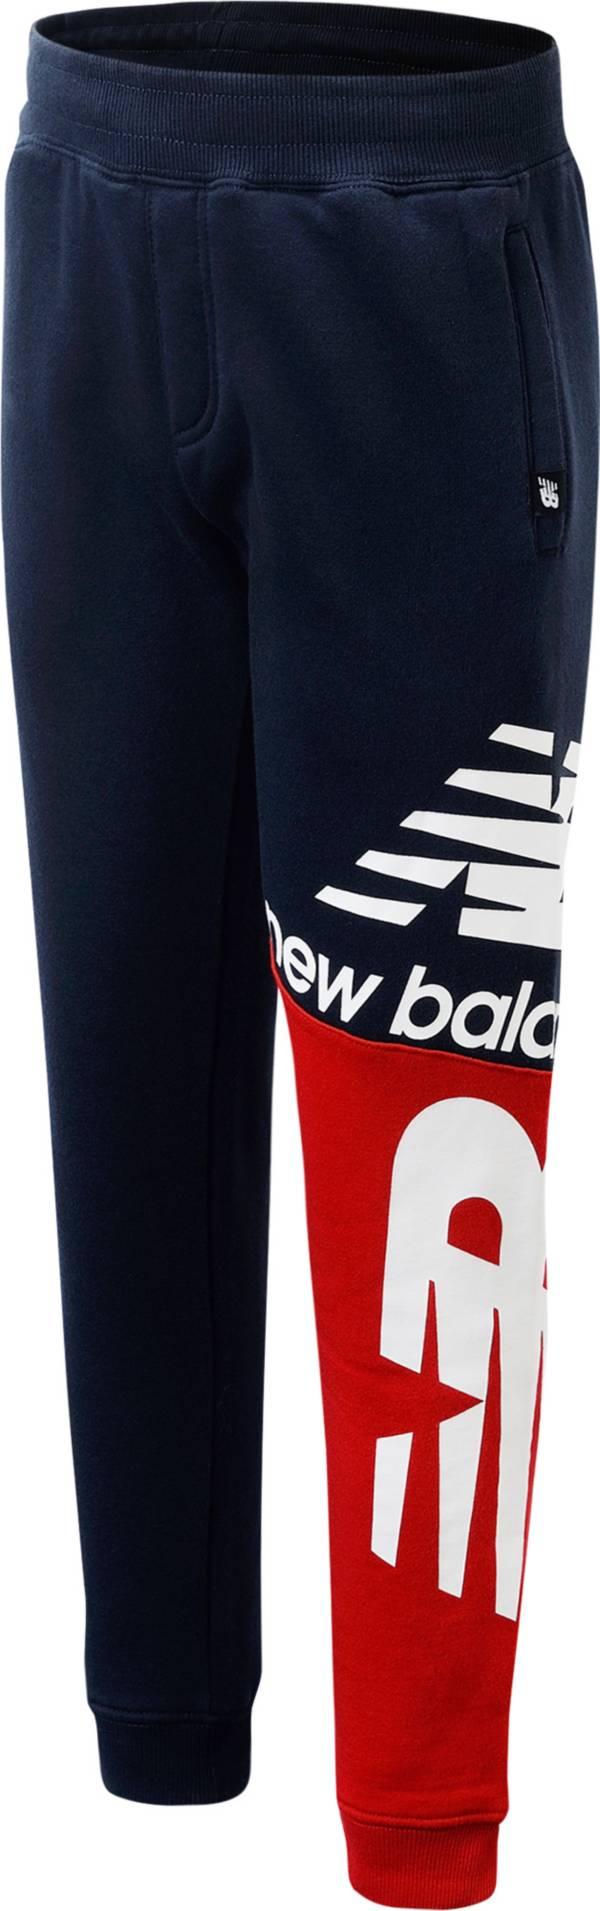 New Balance Boys' Lifestyle Fleece Jogger Pants product image